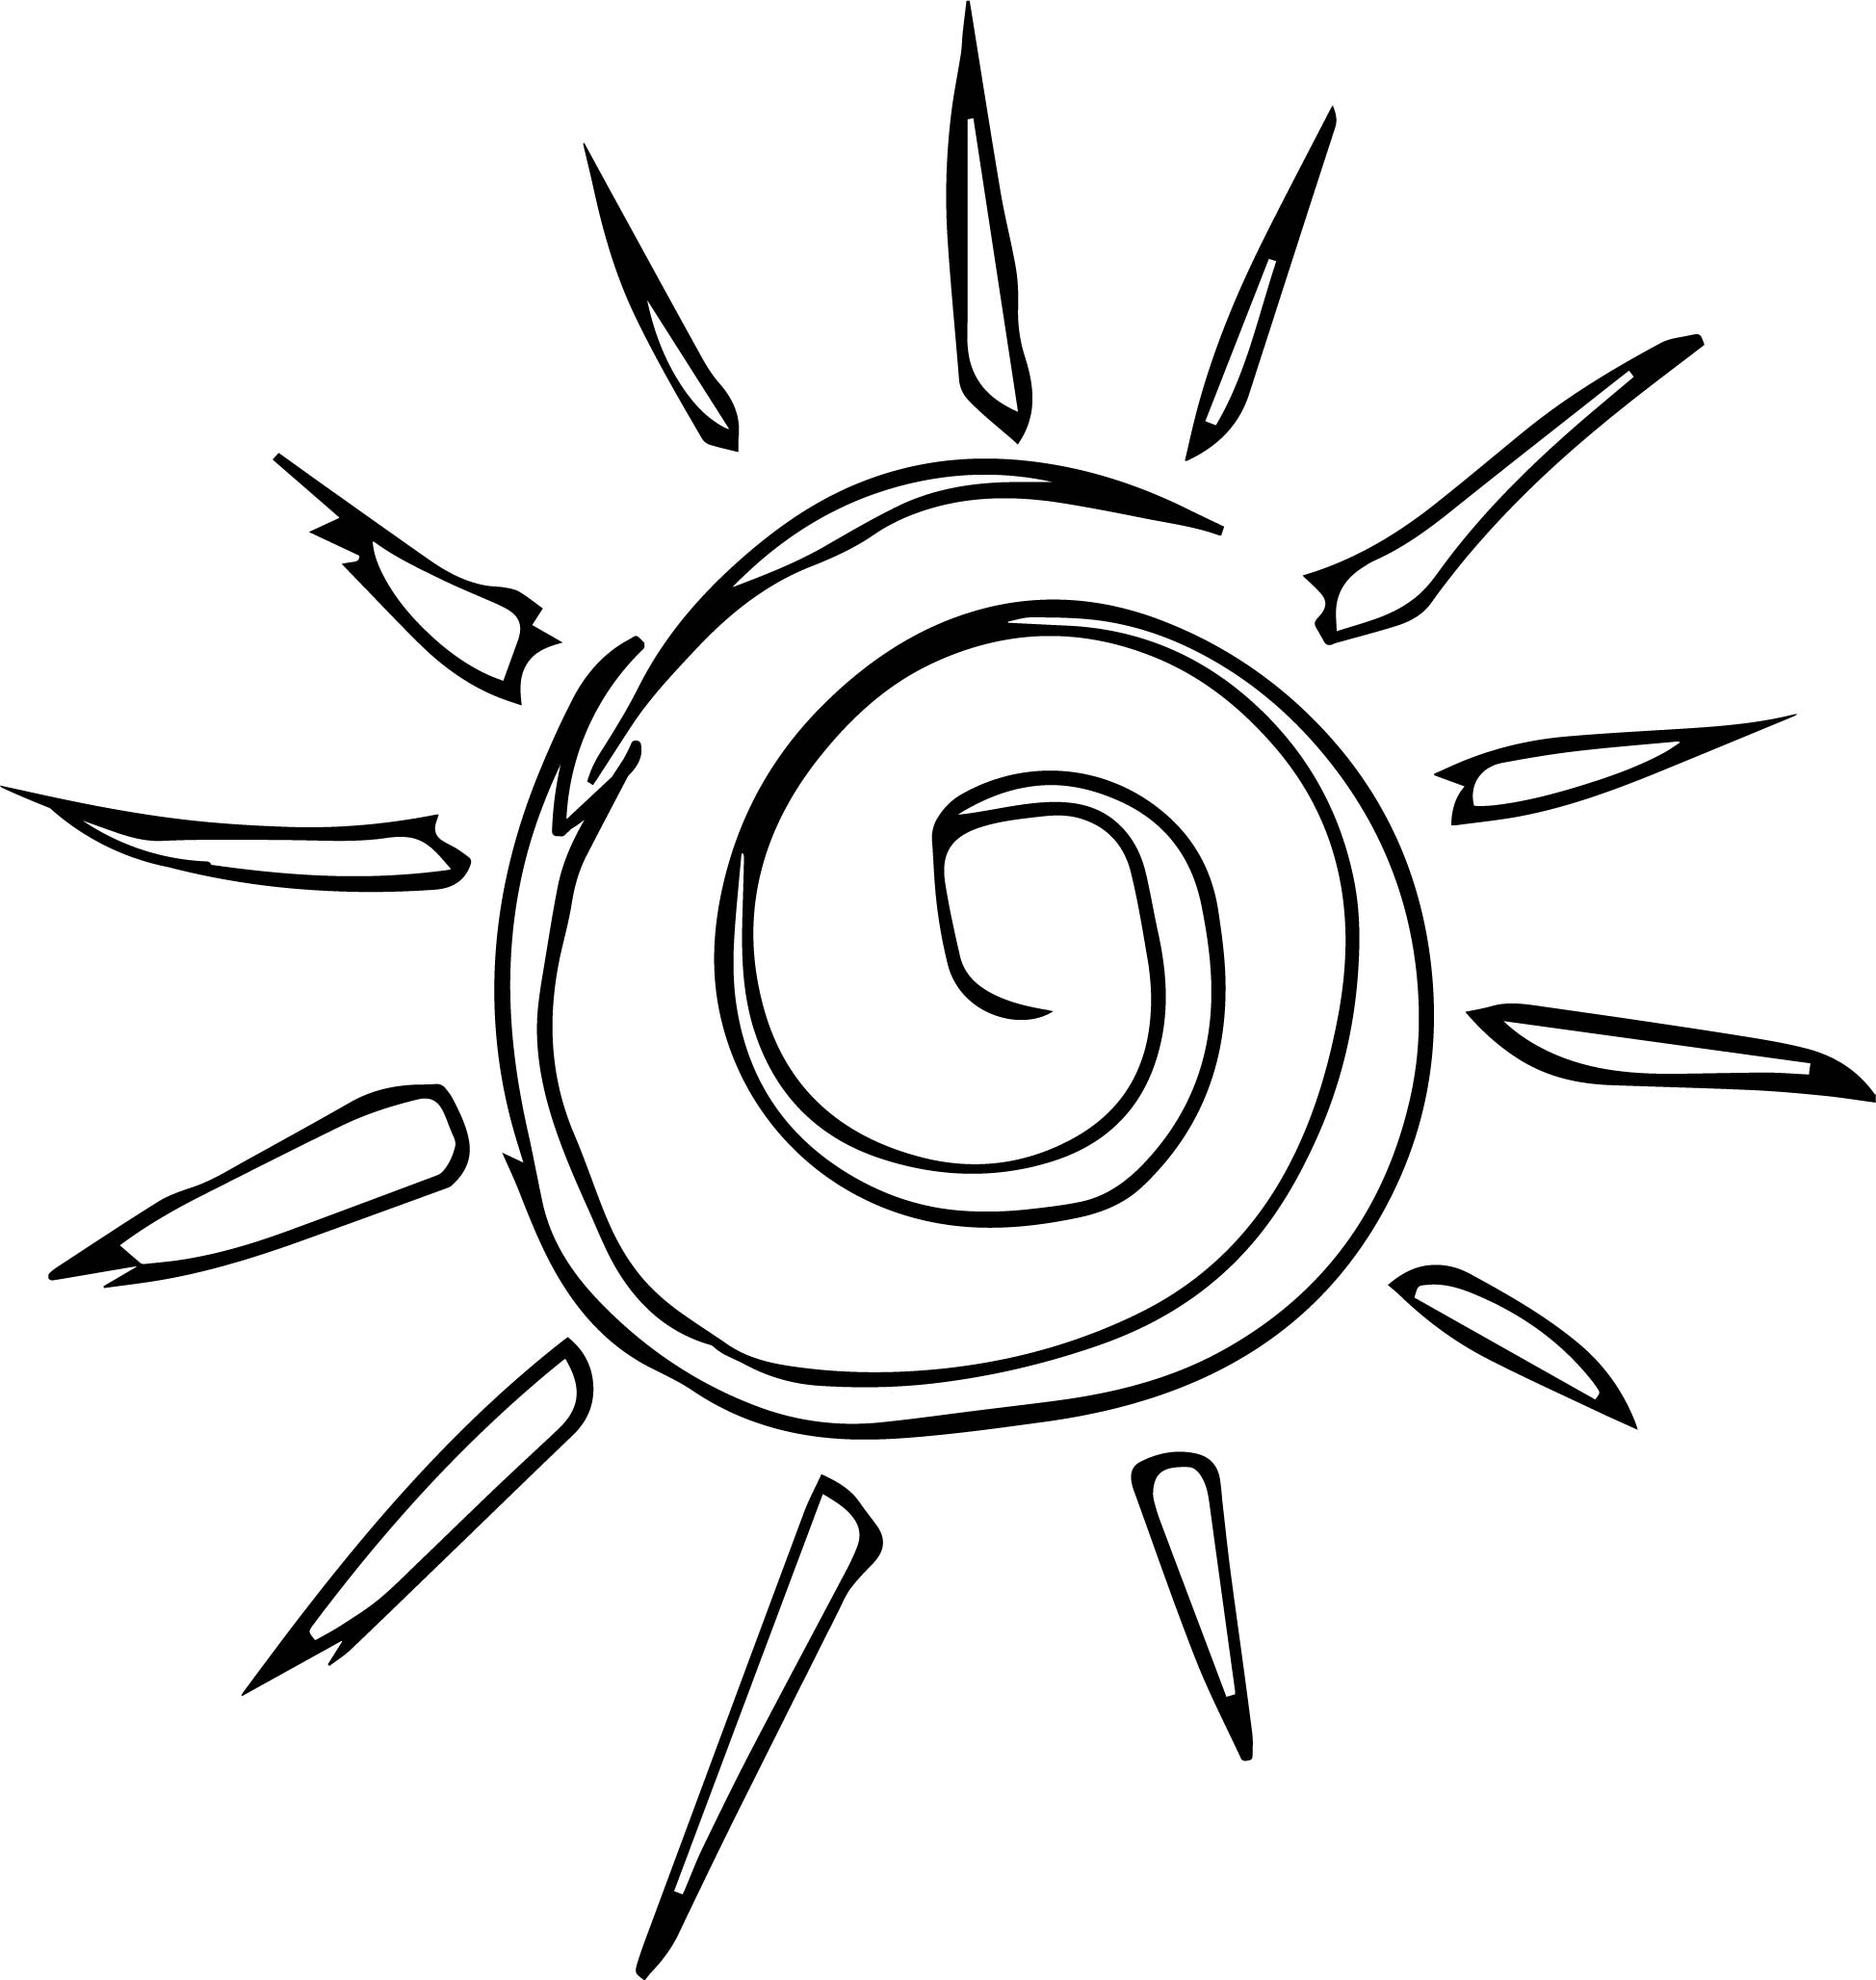 Simple Sun Motif Cartoon Coloring Page